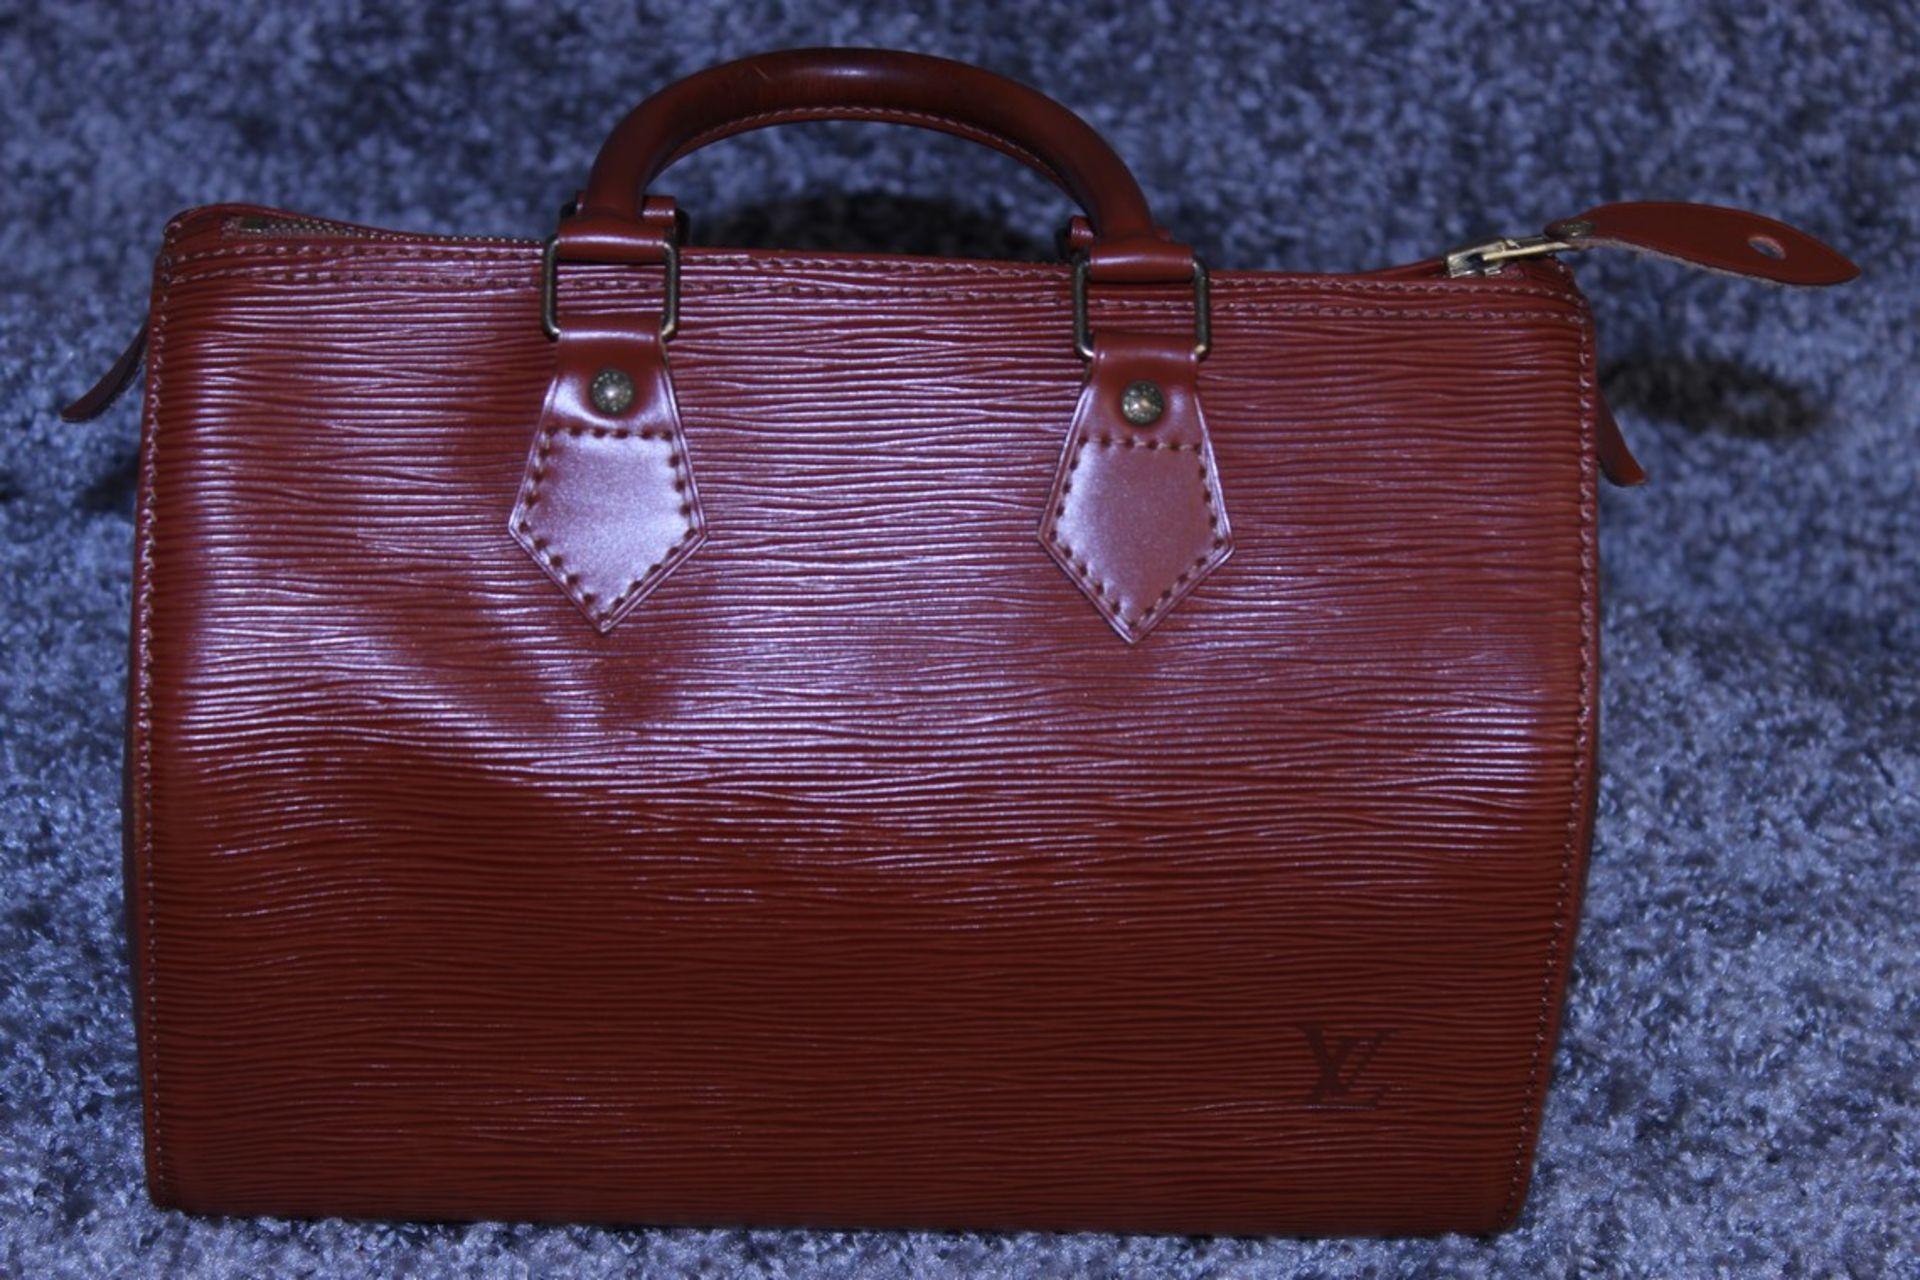 RRP £1,000 Louis Vuitton Speedy 25 Handbag, Tan Epi Calf Leather 27X19X15Cm (Production Code Vi1922) - Image 2 of 3